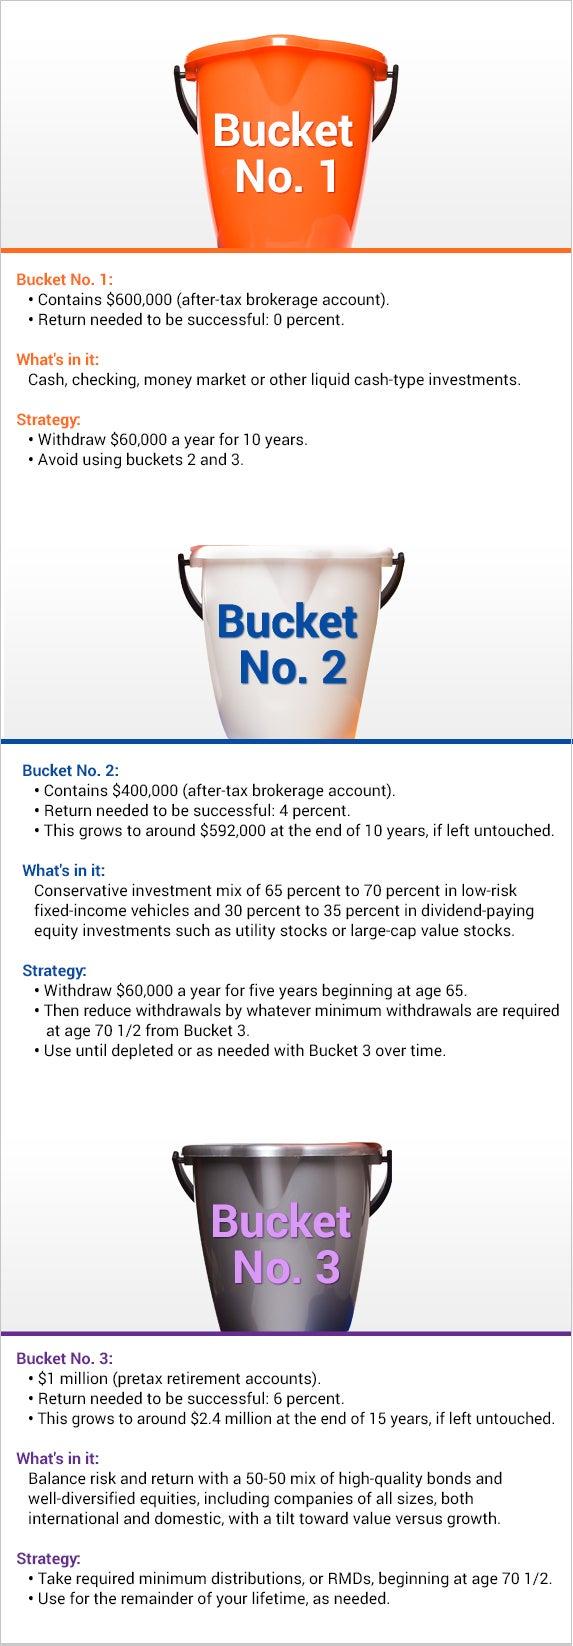 Bucket strategies © Danil Nevsky/Shutterstock.com